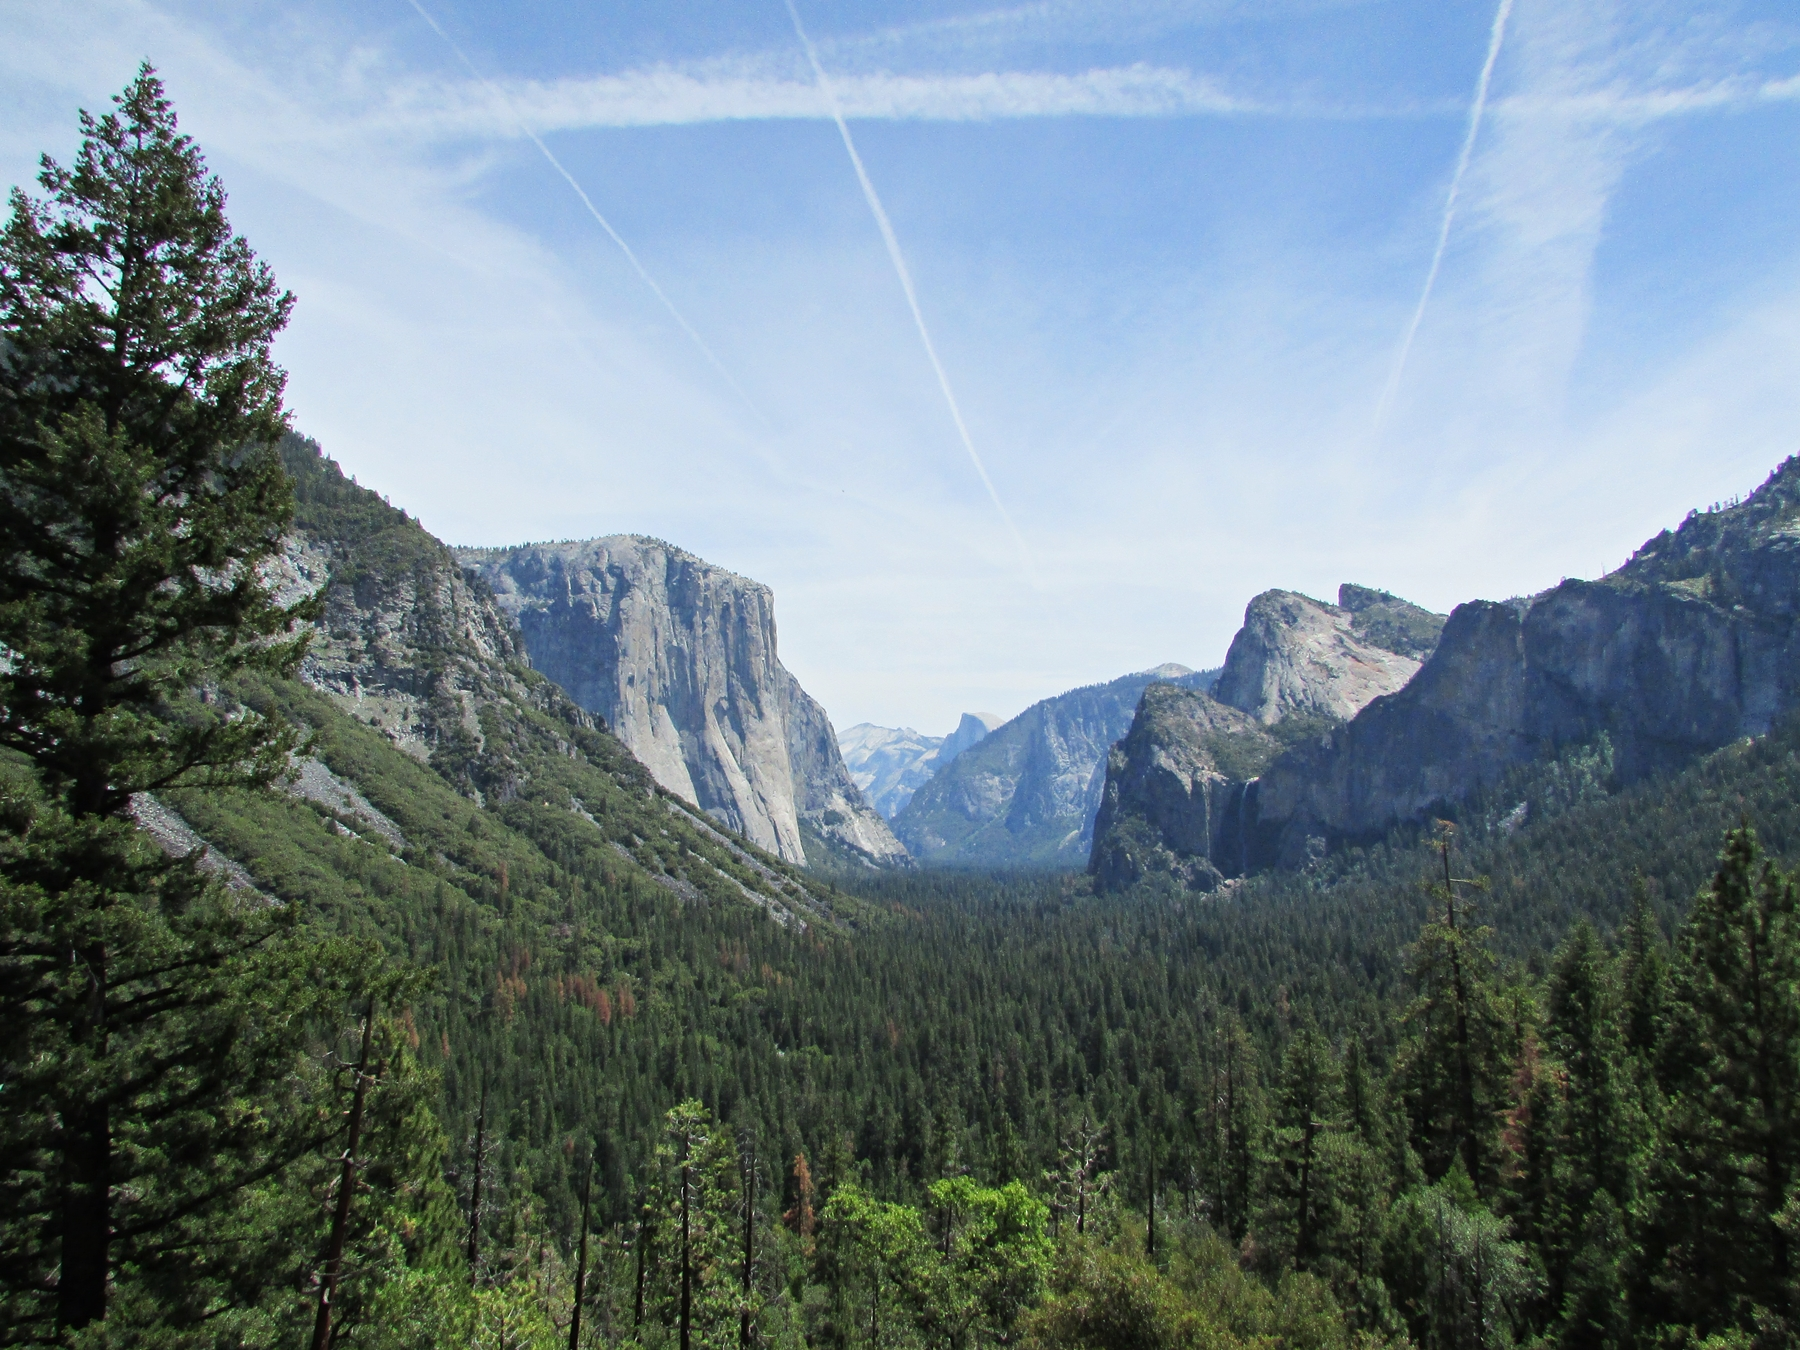 USA Rundreise - Amerika Westküste - Yosemite Nationalpark - Tunnel View - Fashionladyloves